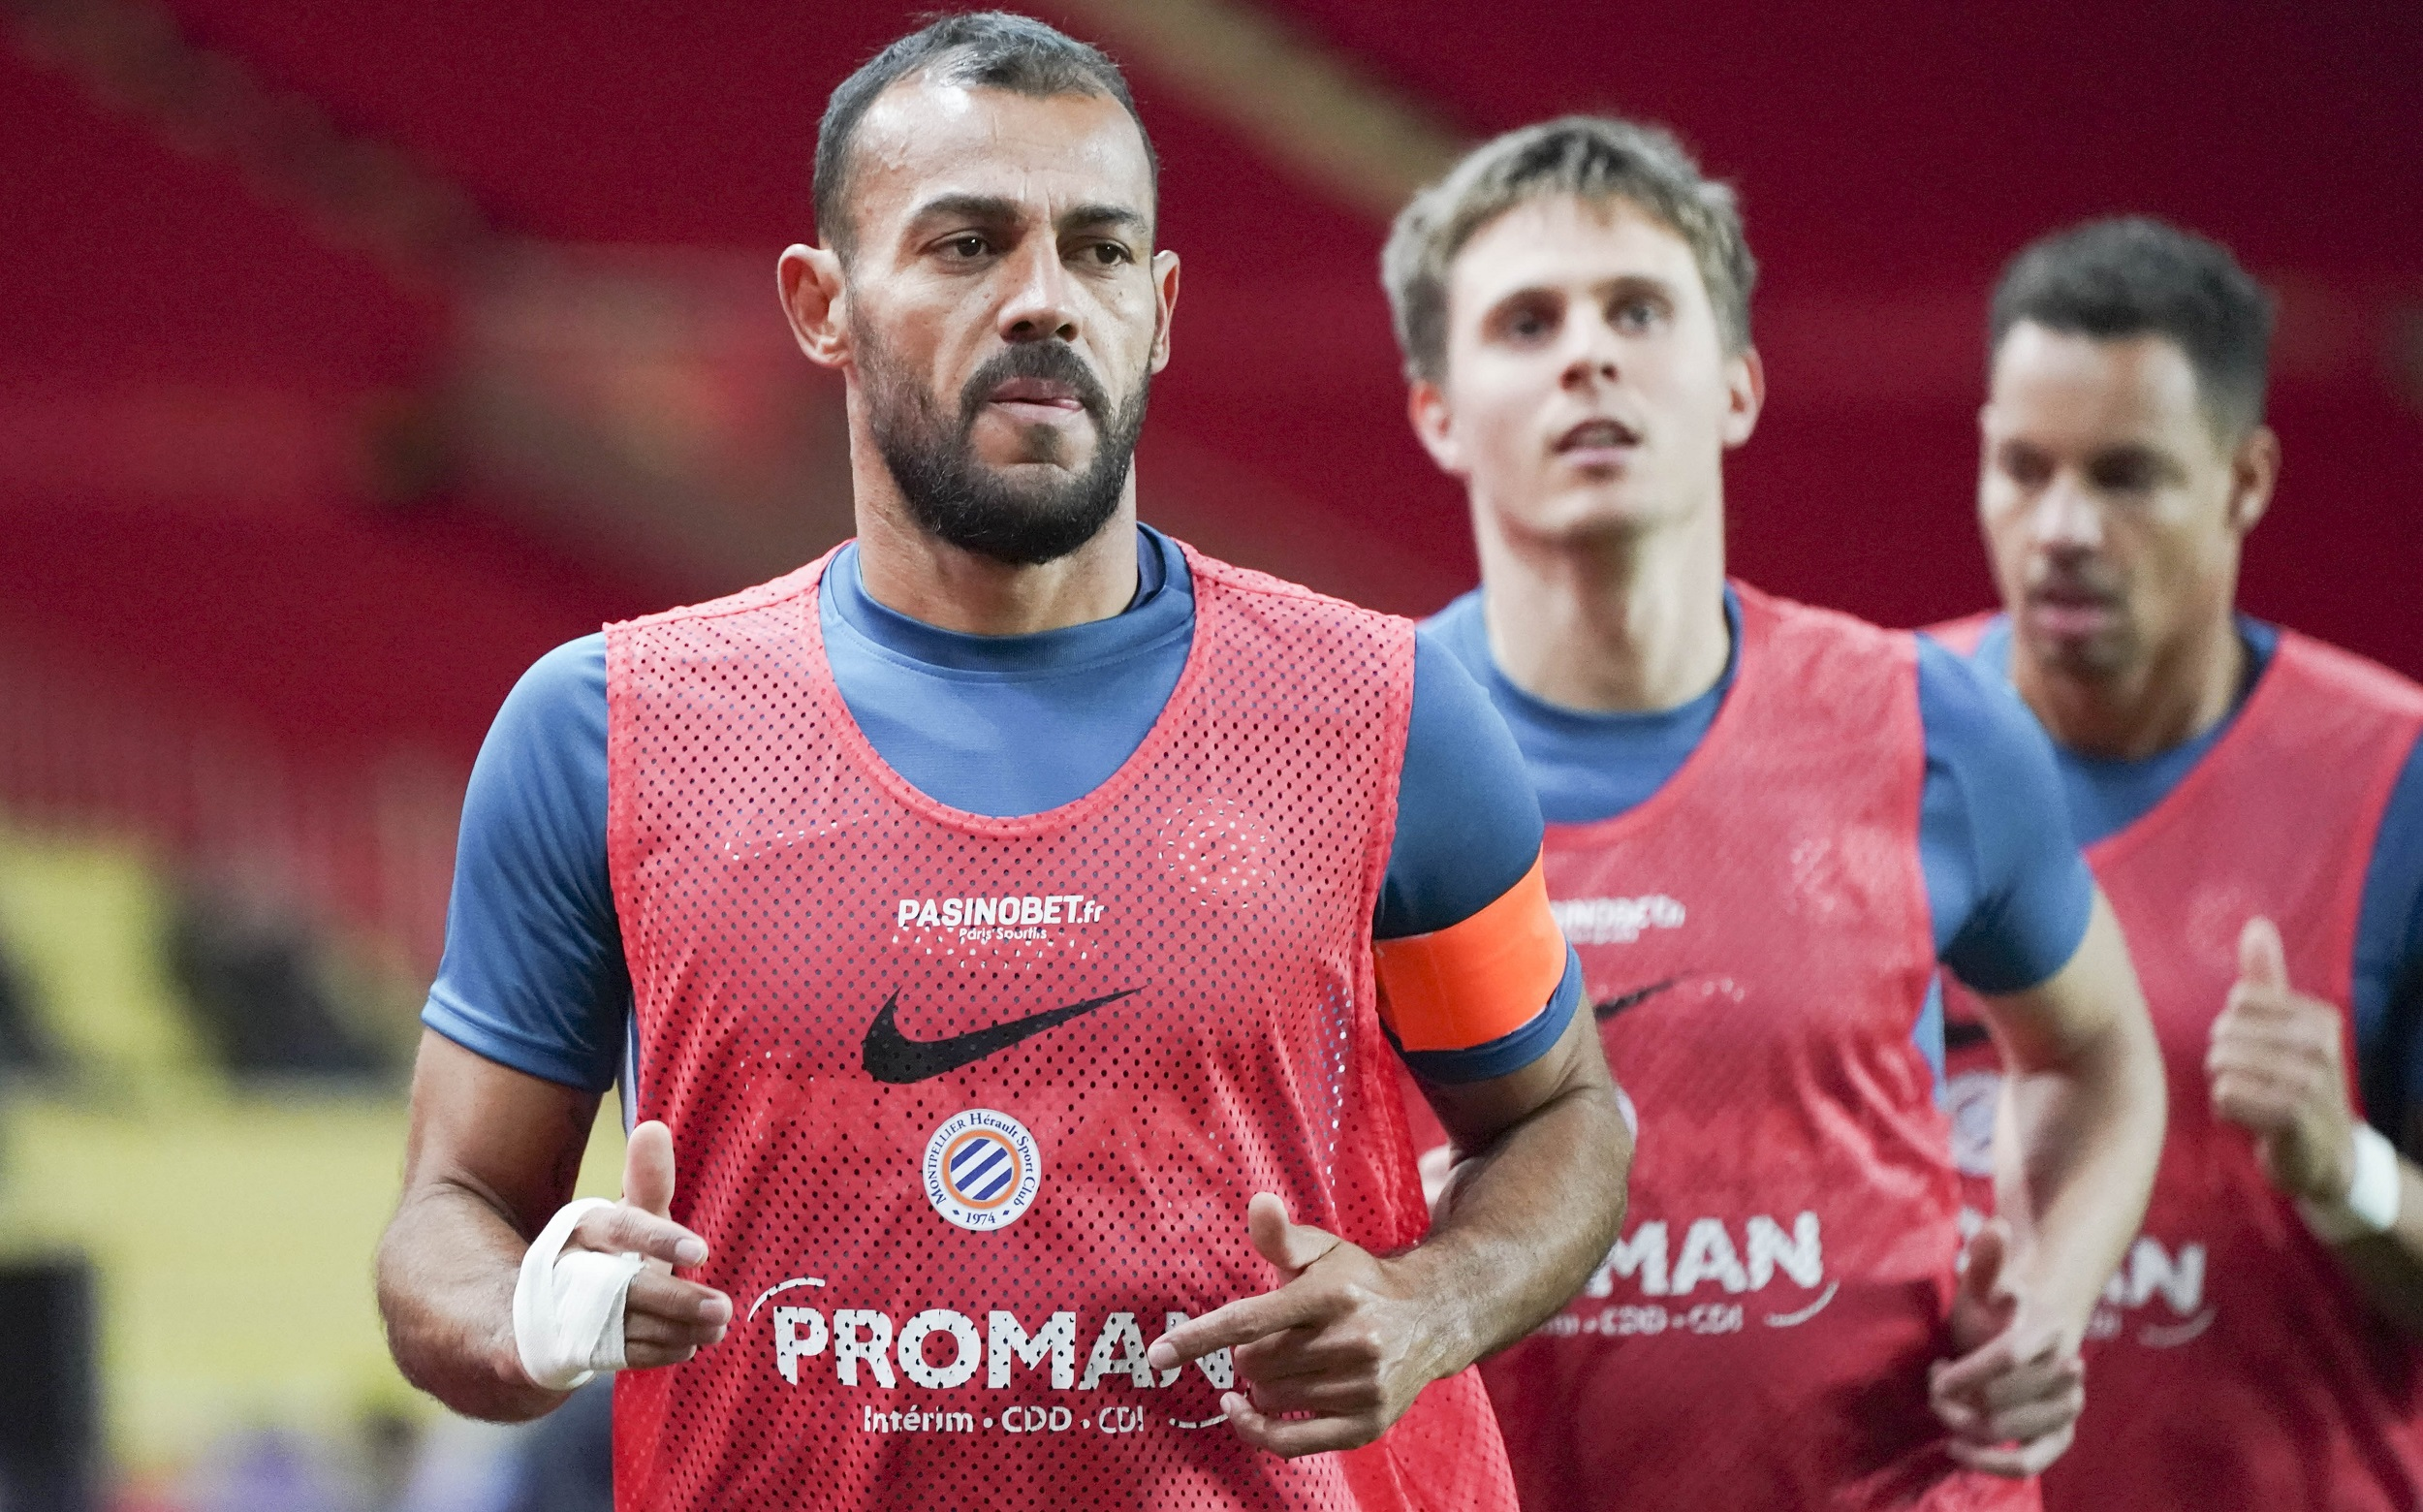 Football - Transferts - Montpellier : éternel, Vitorino Hilton rempile à 42 ans